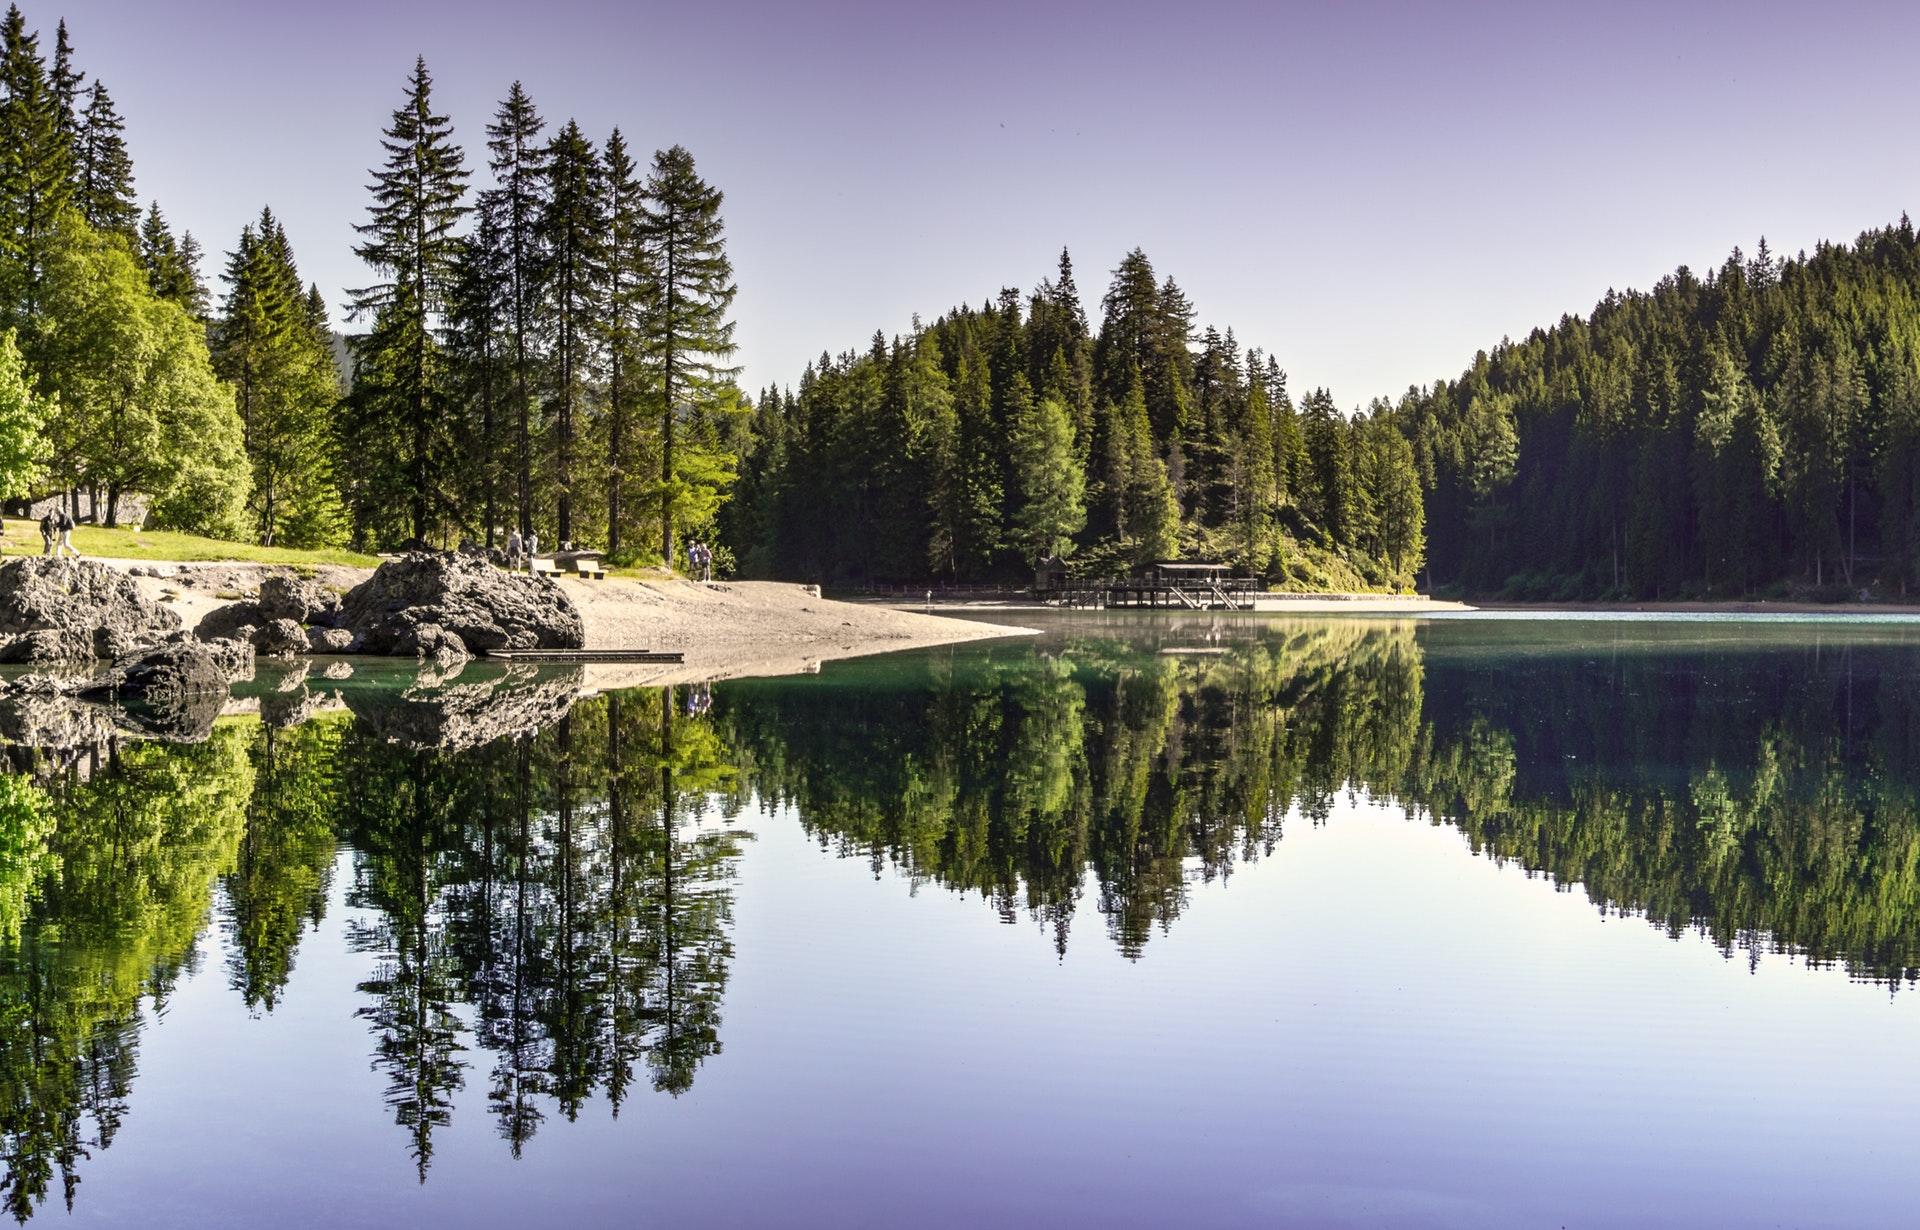 Varpaisjärven kiinnostava kulttuuriympäristö